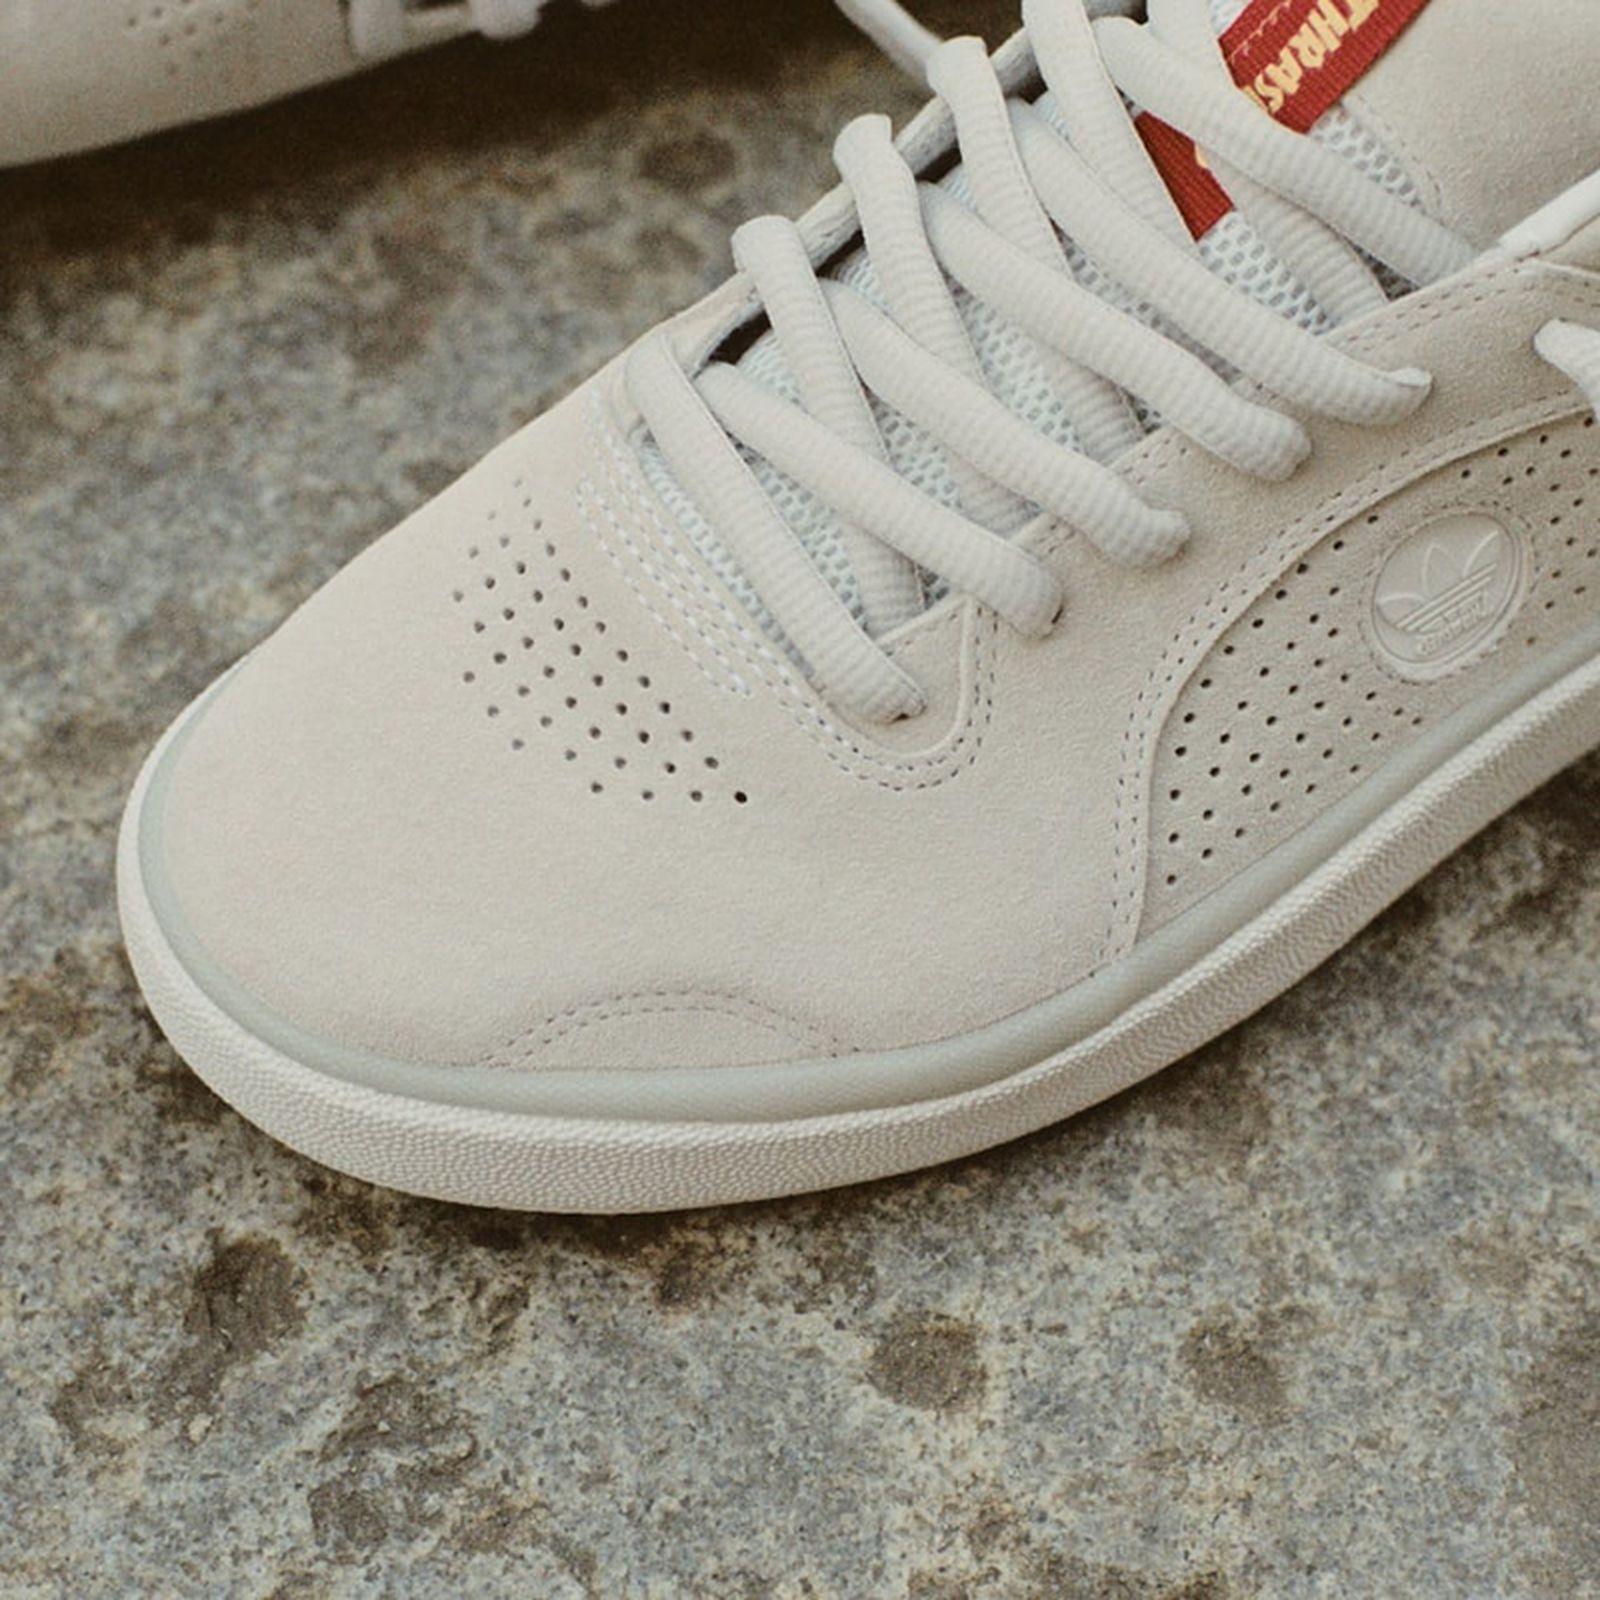 thrasher-adidas-superstar-adv-tyshawn-jones-release-date-price-08